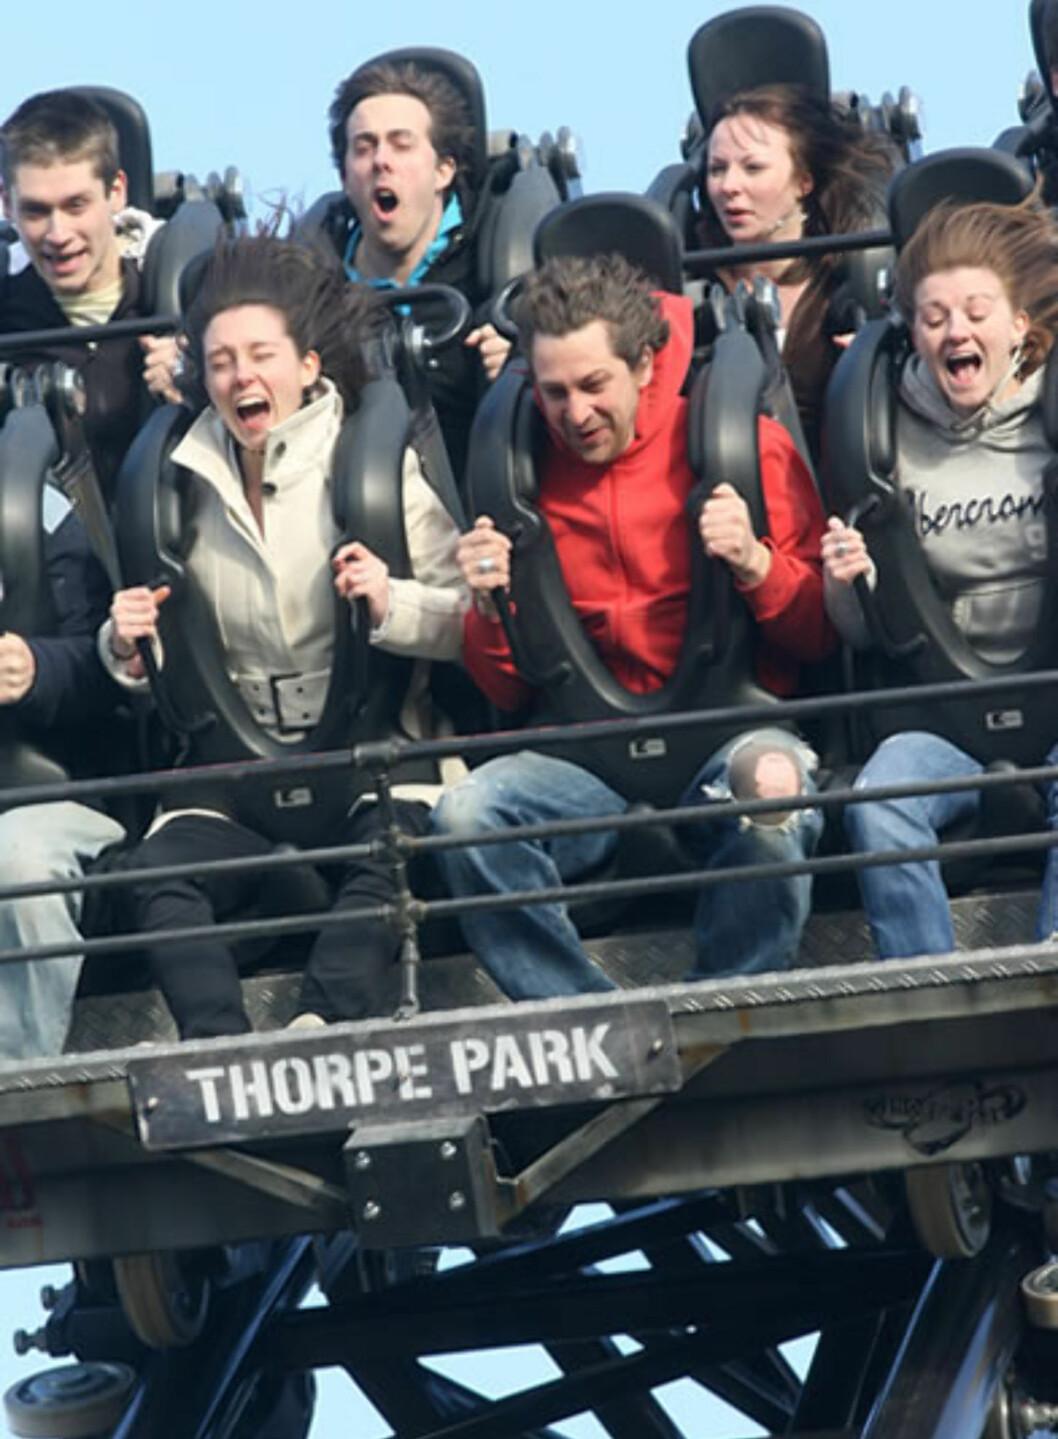 Foto: Thorpe Park